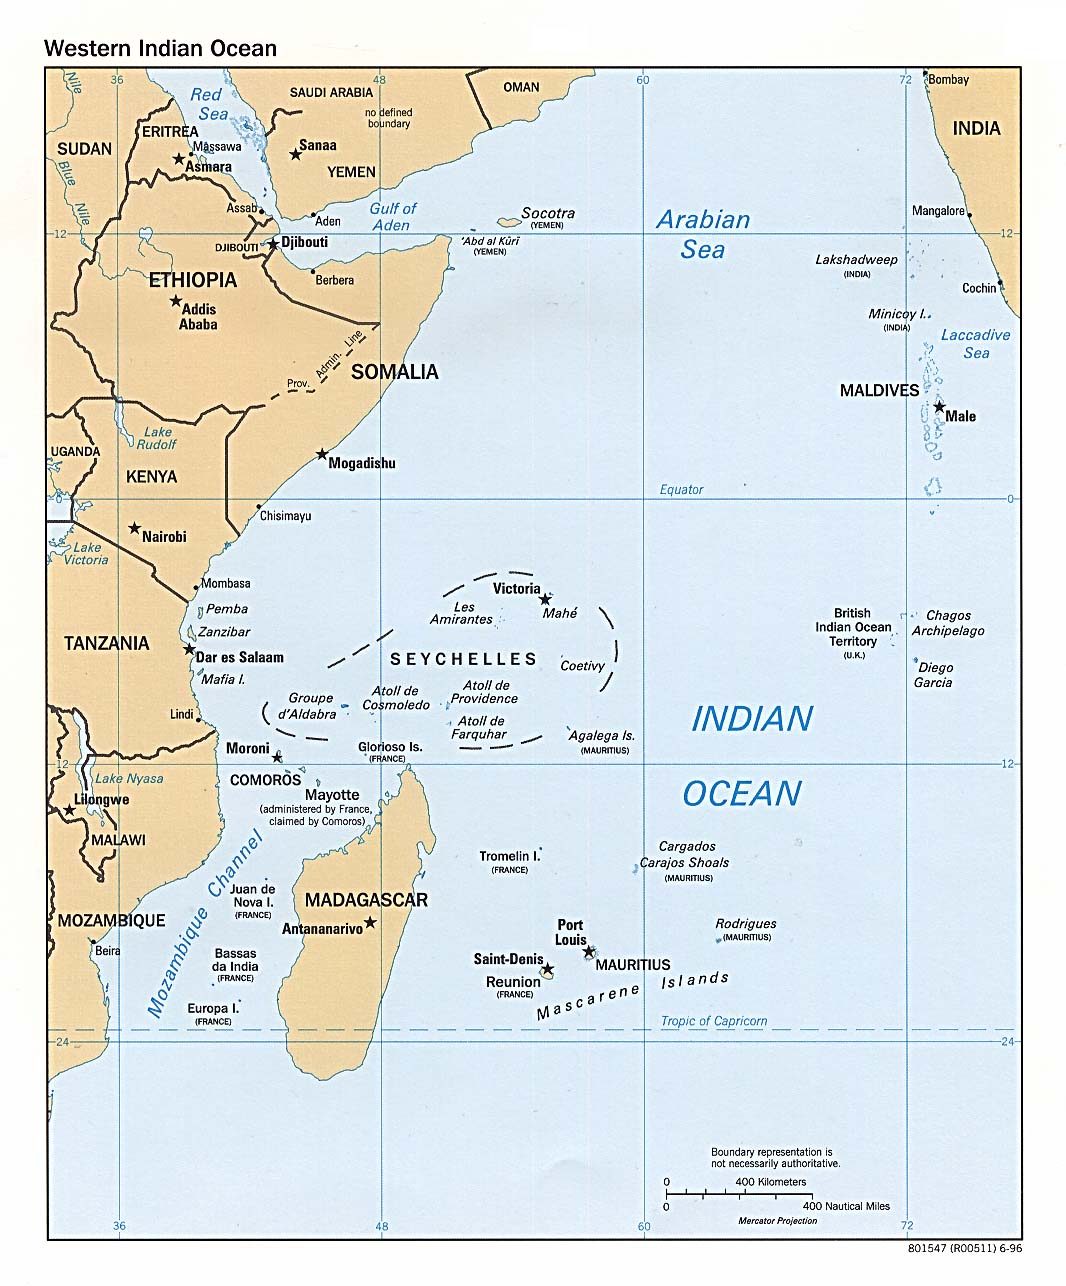 The western Indian Ocean